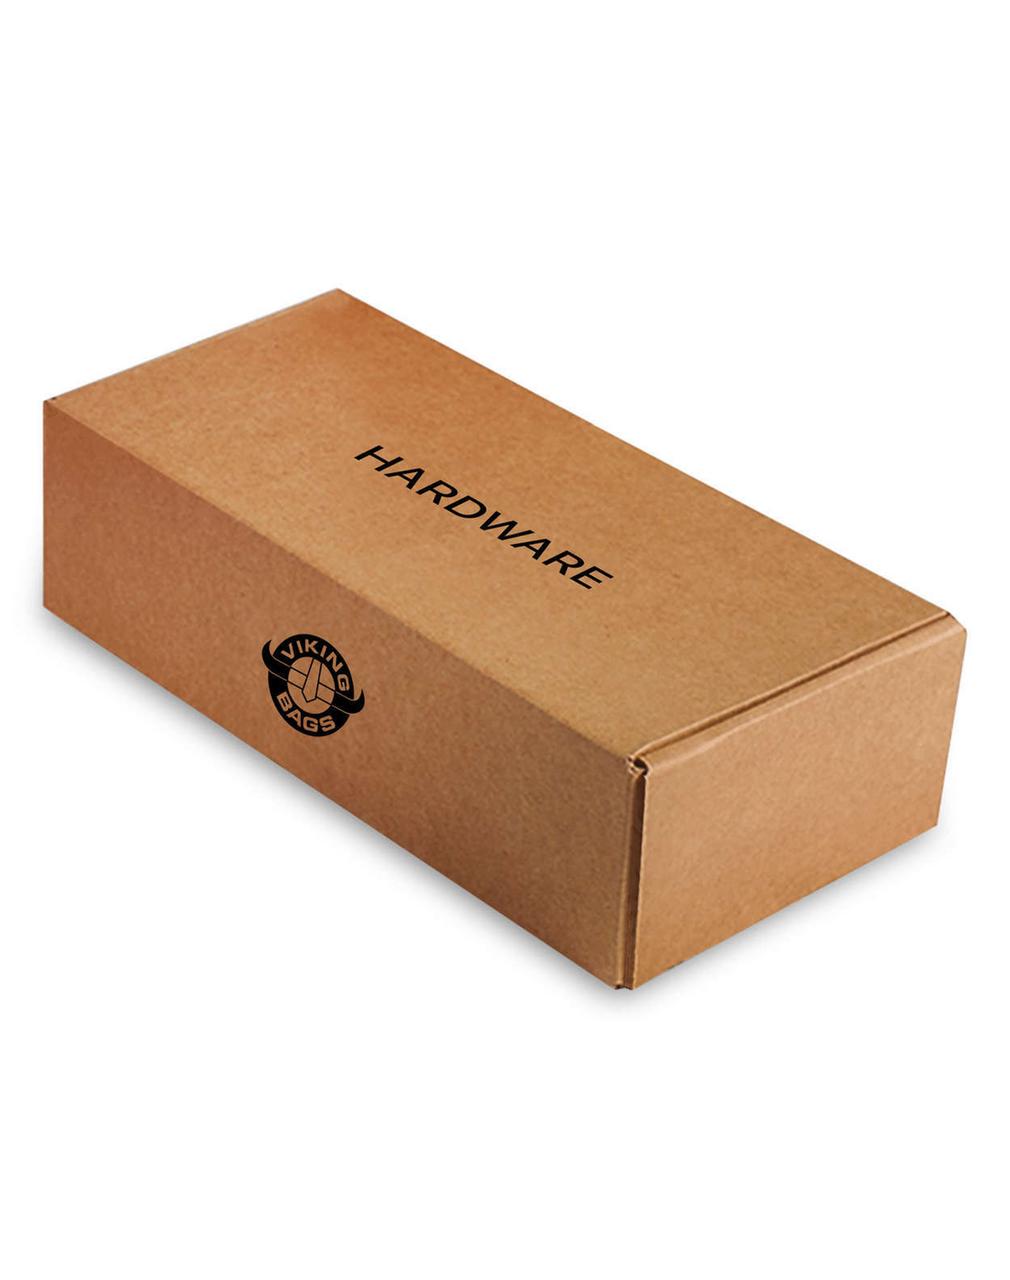 Honda 1500 Valkyrie Standard Uni Warrior Slanted L Motorcycle saddlebags Box